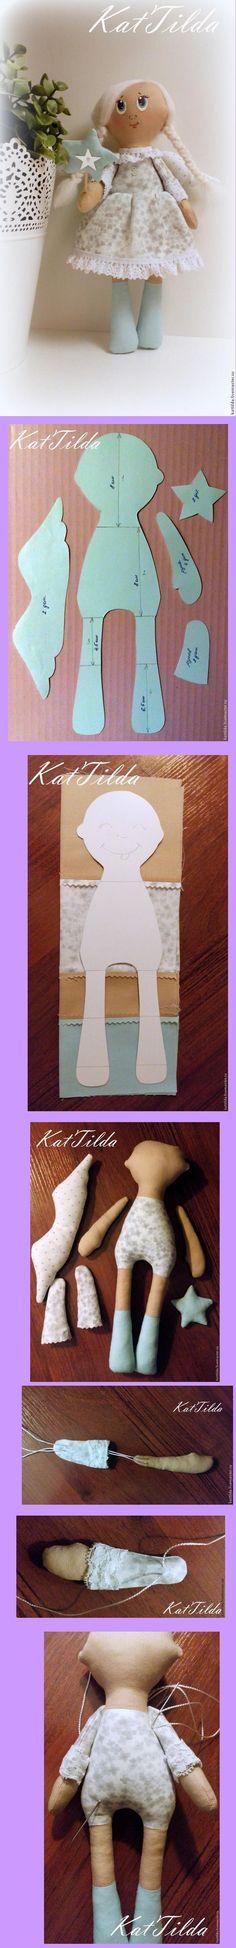 BONECA DE PANO COM MOLDES free pattern: Angel Cloth Dolo